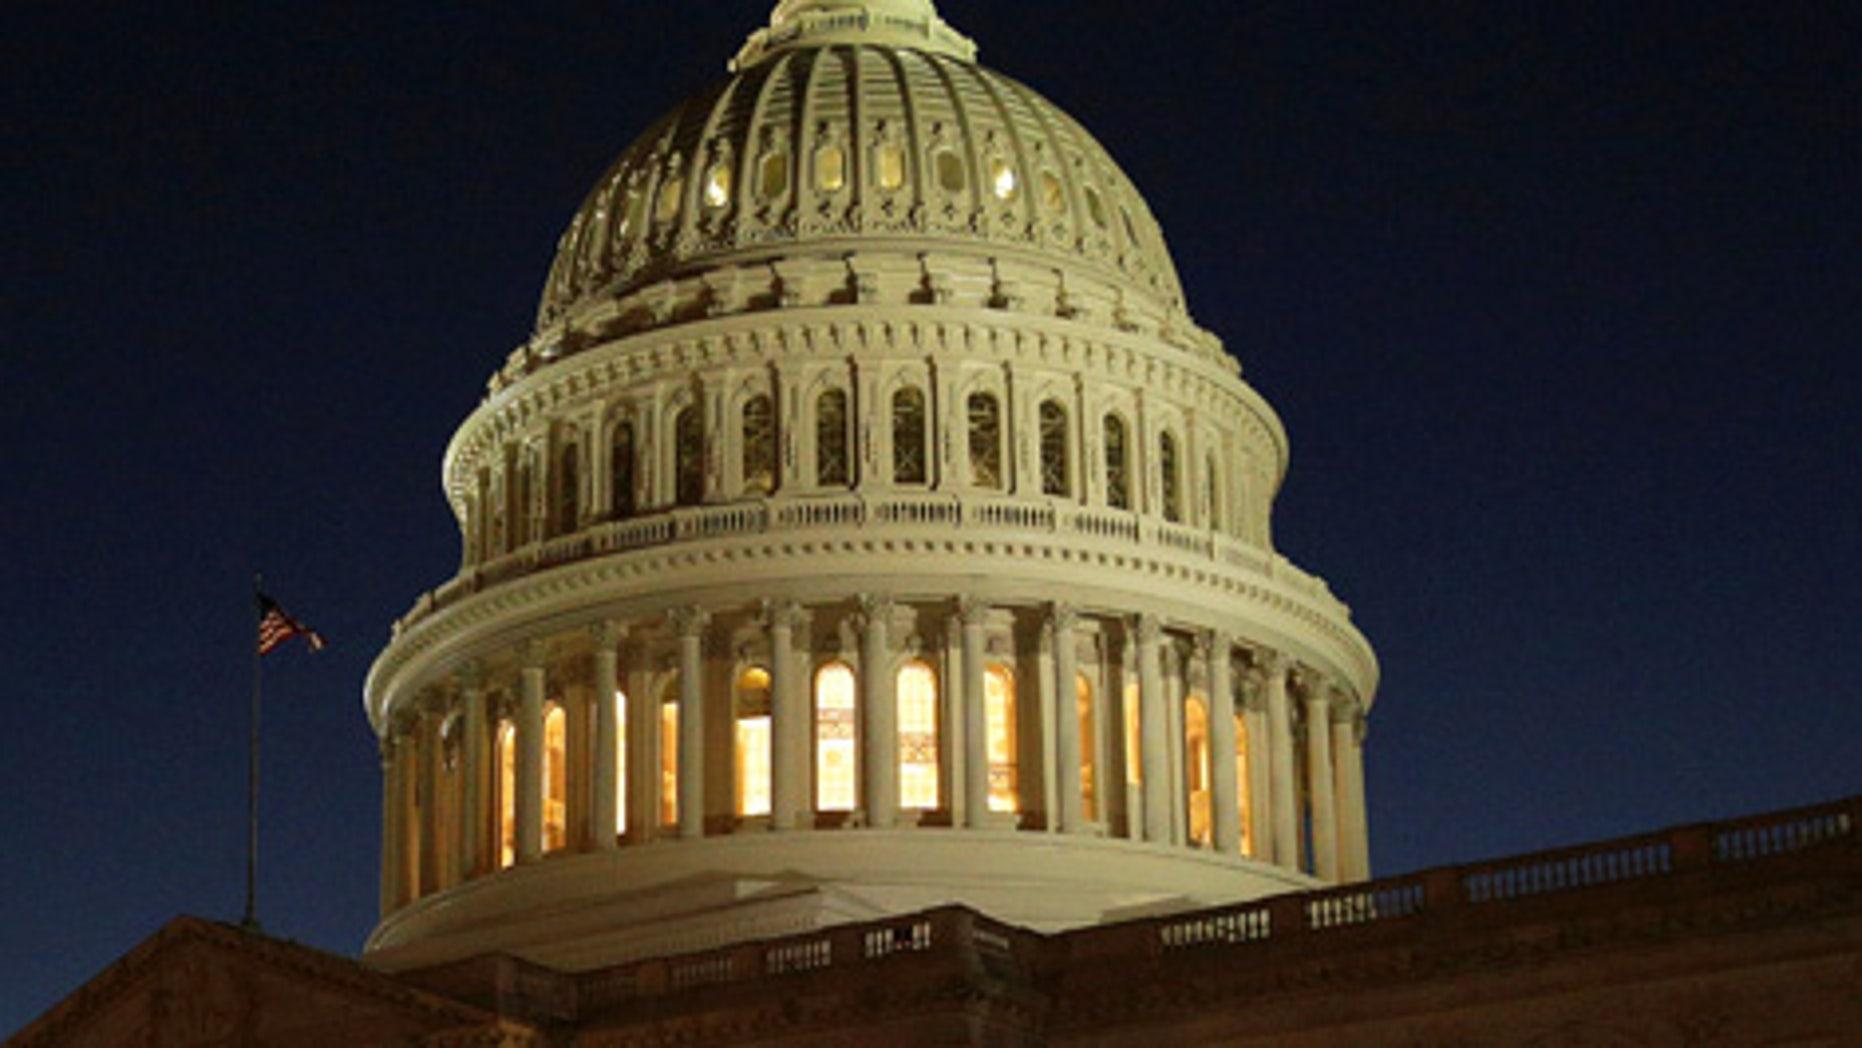 The U.S. Capitol Building is lit at sunset in Washington, U.S., December 20, 2016.  REUTERS/Joshua Roberts - RTX2VXU6